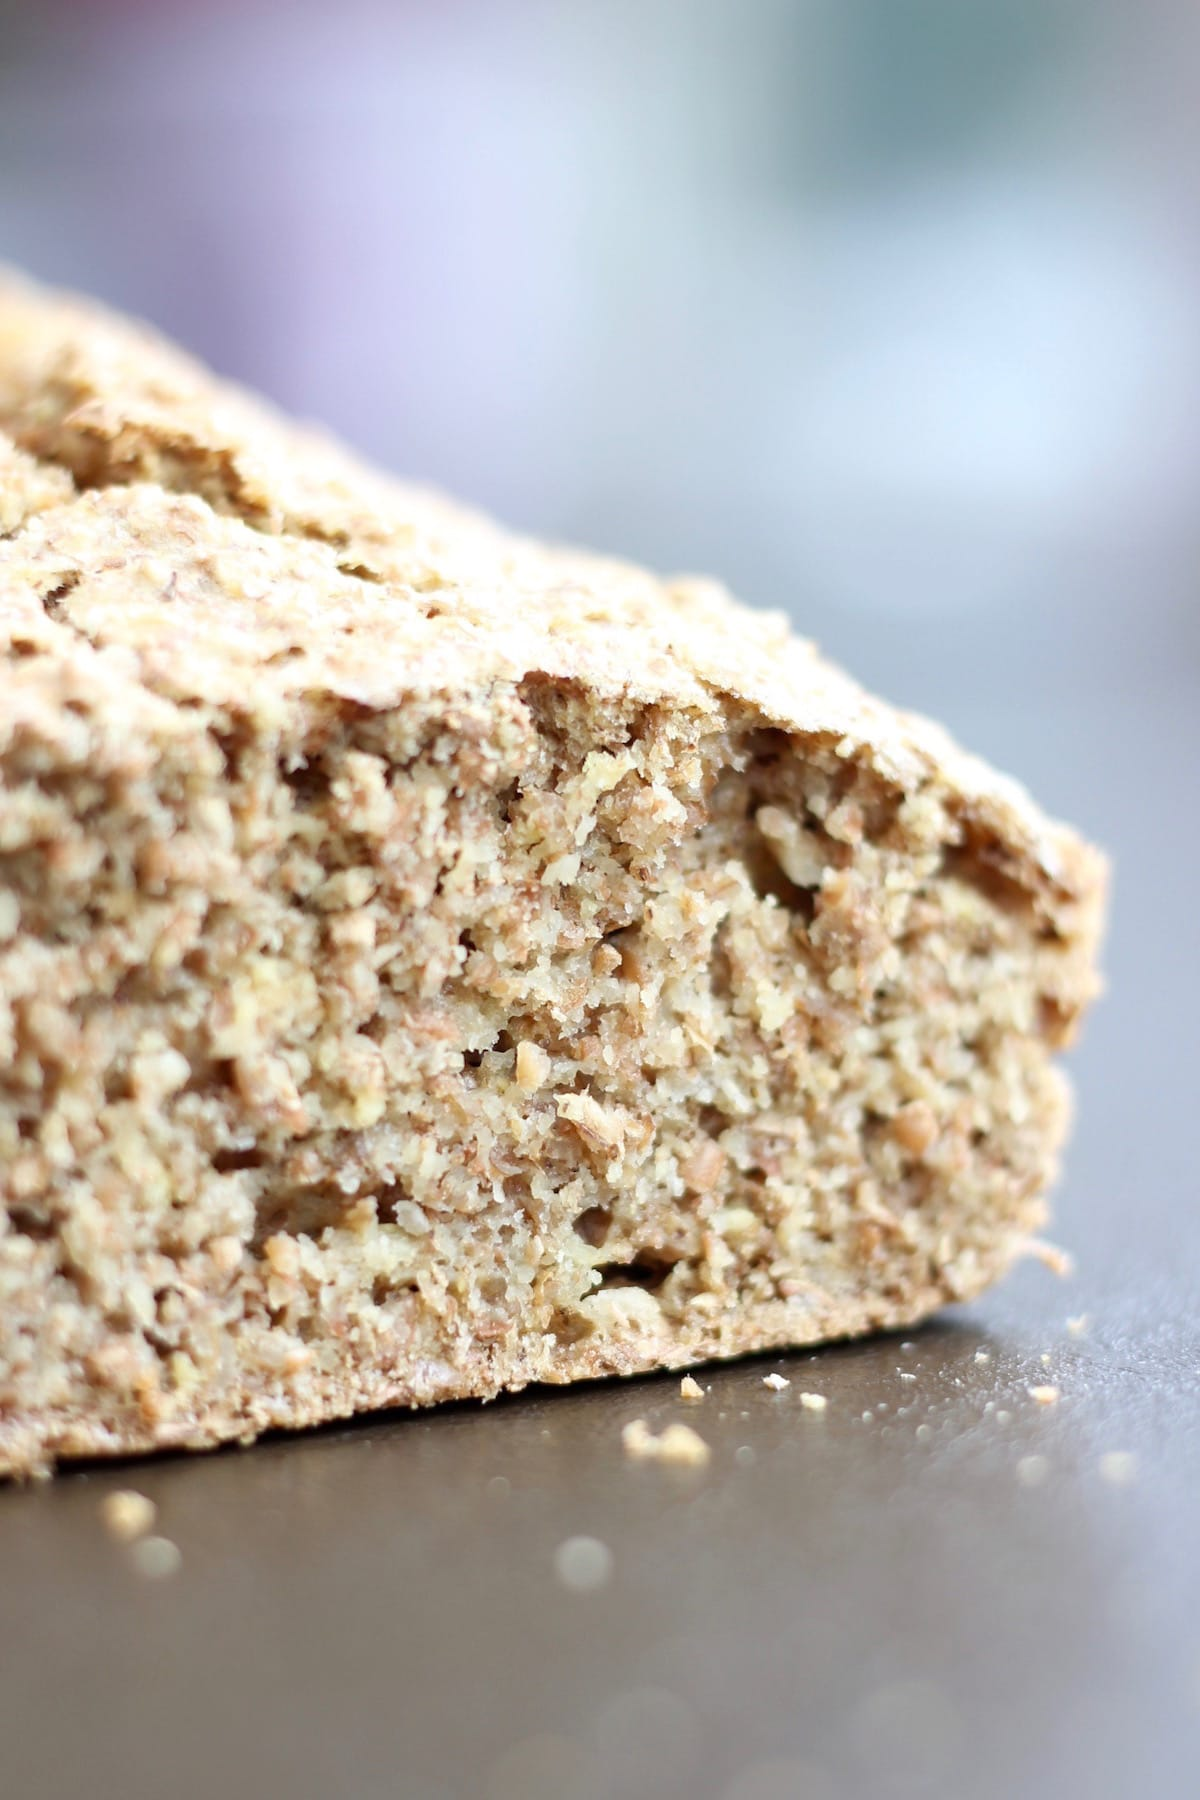 doughy brown bread